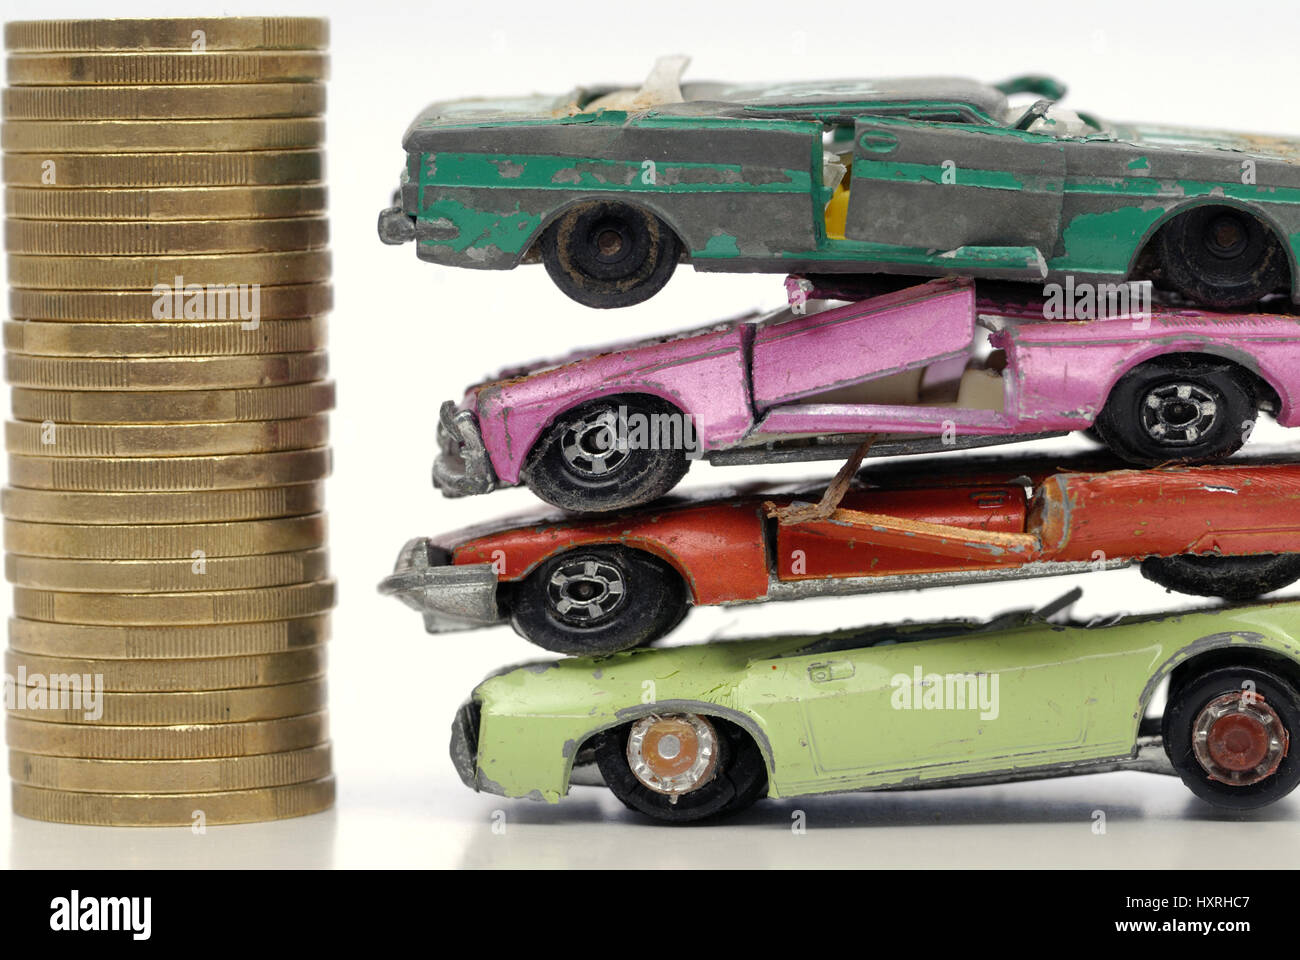 Car, cars, miniature car, miniature cars, broken, broken, scrapped, scraps, old, old, scrapping premium, cash for clunkers, environmental premium, mon Stock Photo